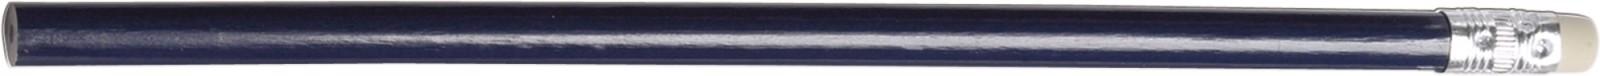 Wooden pencil - Blue